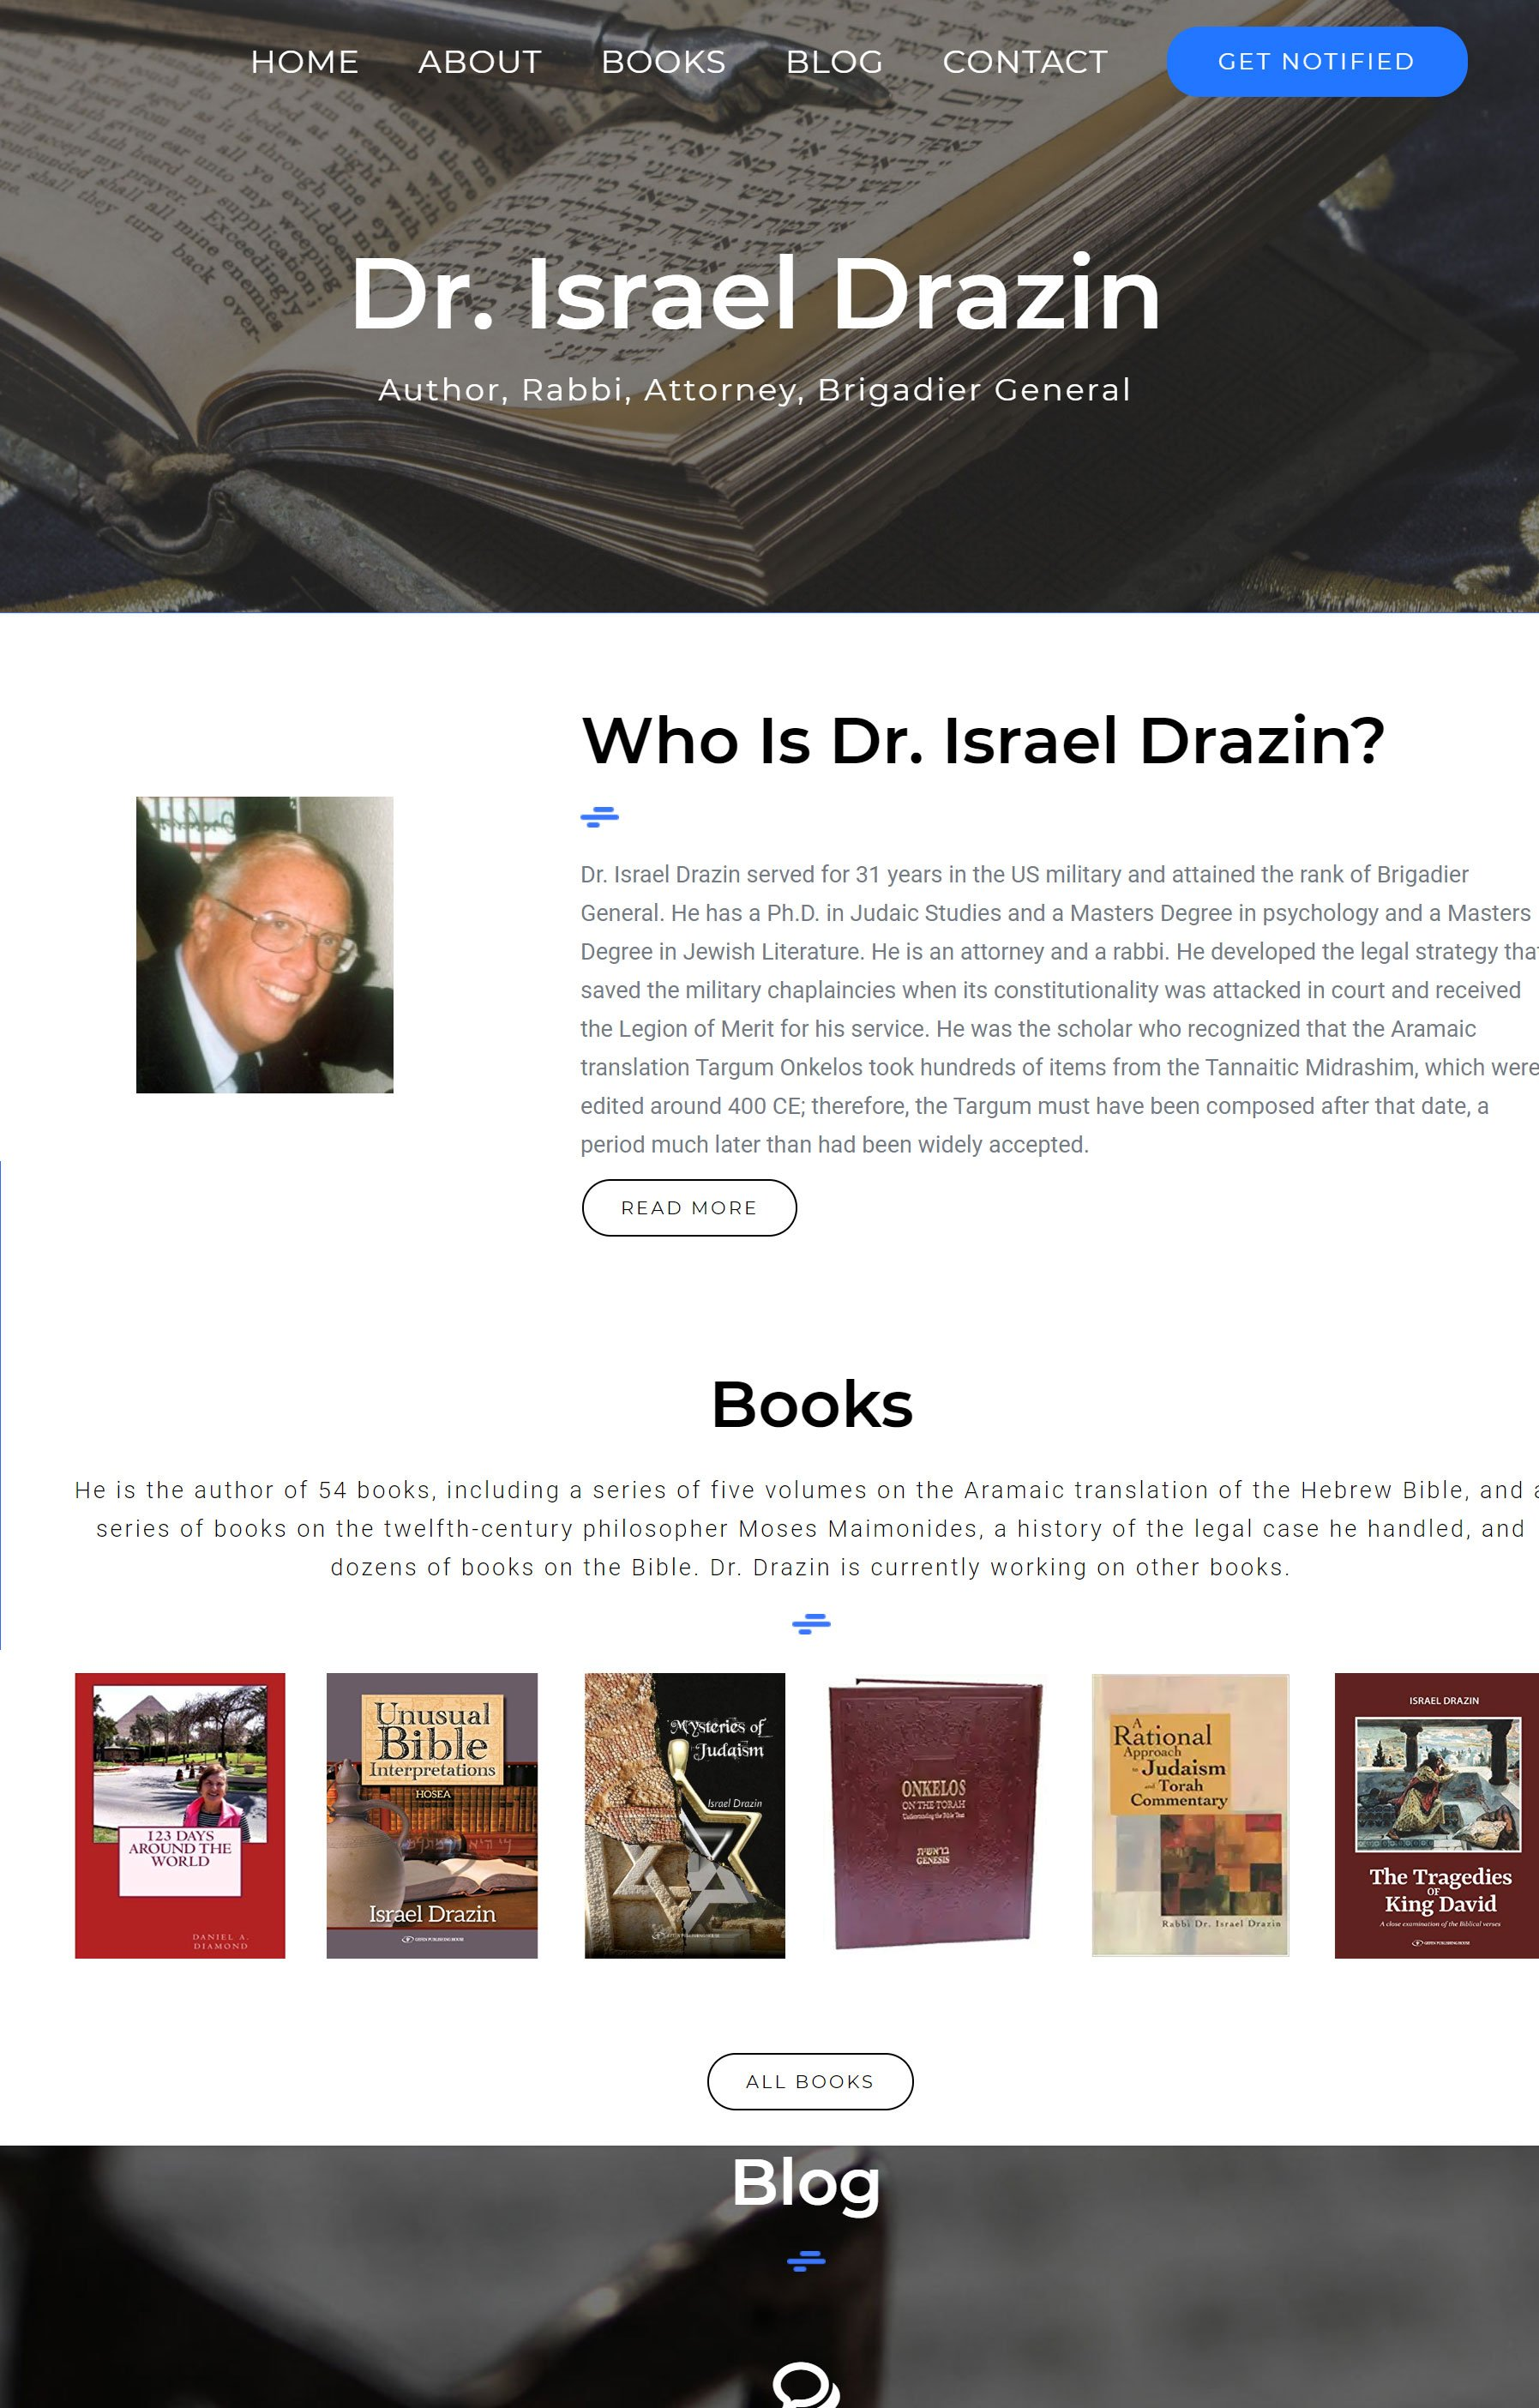 Israel Drazin Website